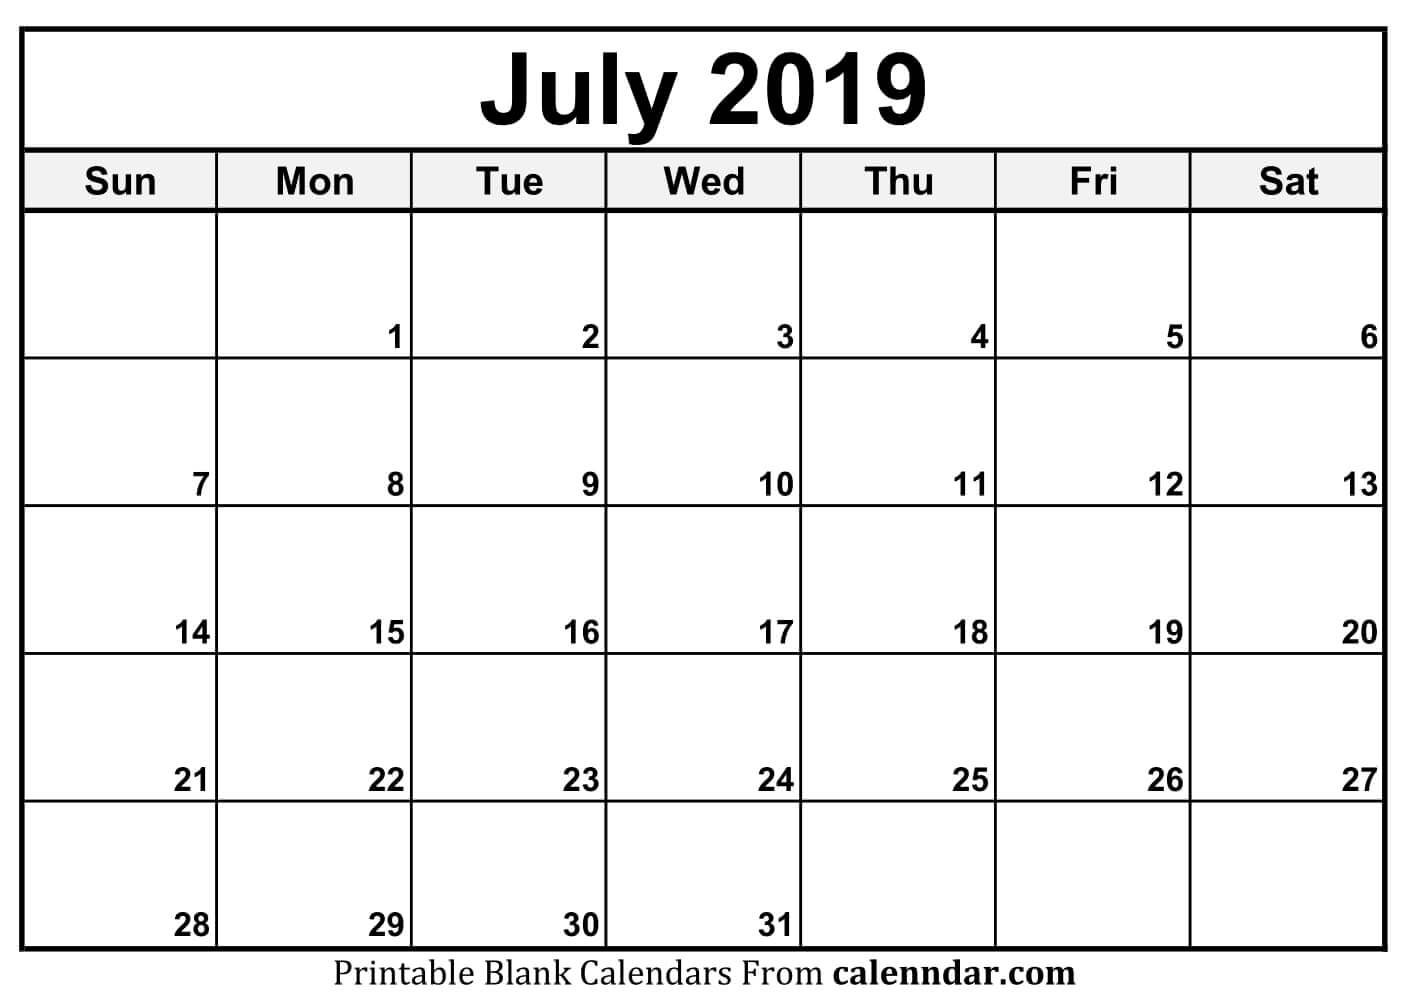 July 2019 Calendar Free Printable